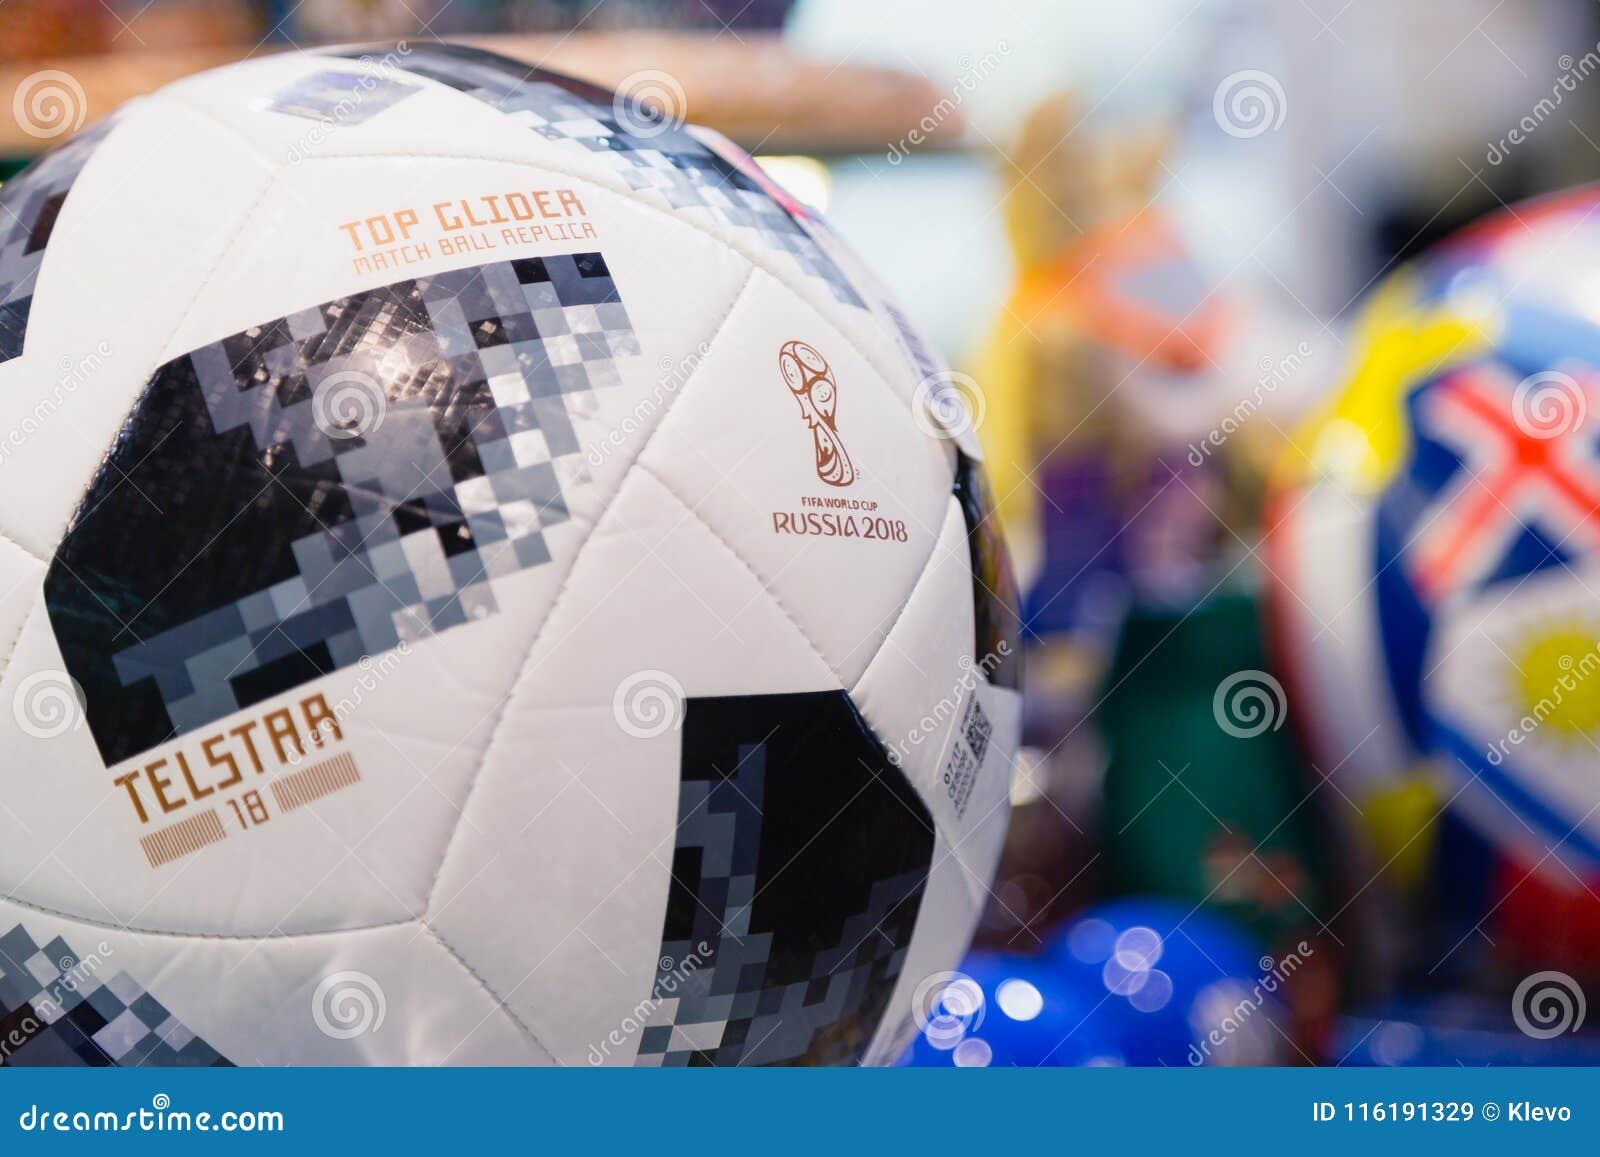 MOSCOU, RÚSSIA - 30 DE ABRIL DE 2018: Réplica SUPERIOR da bola do fósforo do PLANADOR para o campeonato do mundo FIFA 2018 mundia